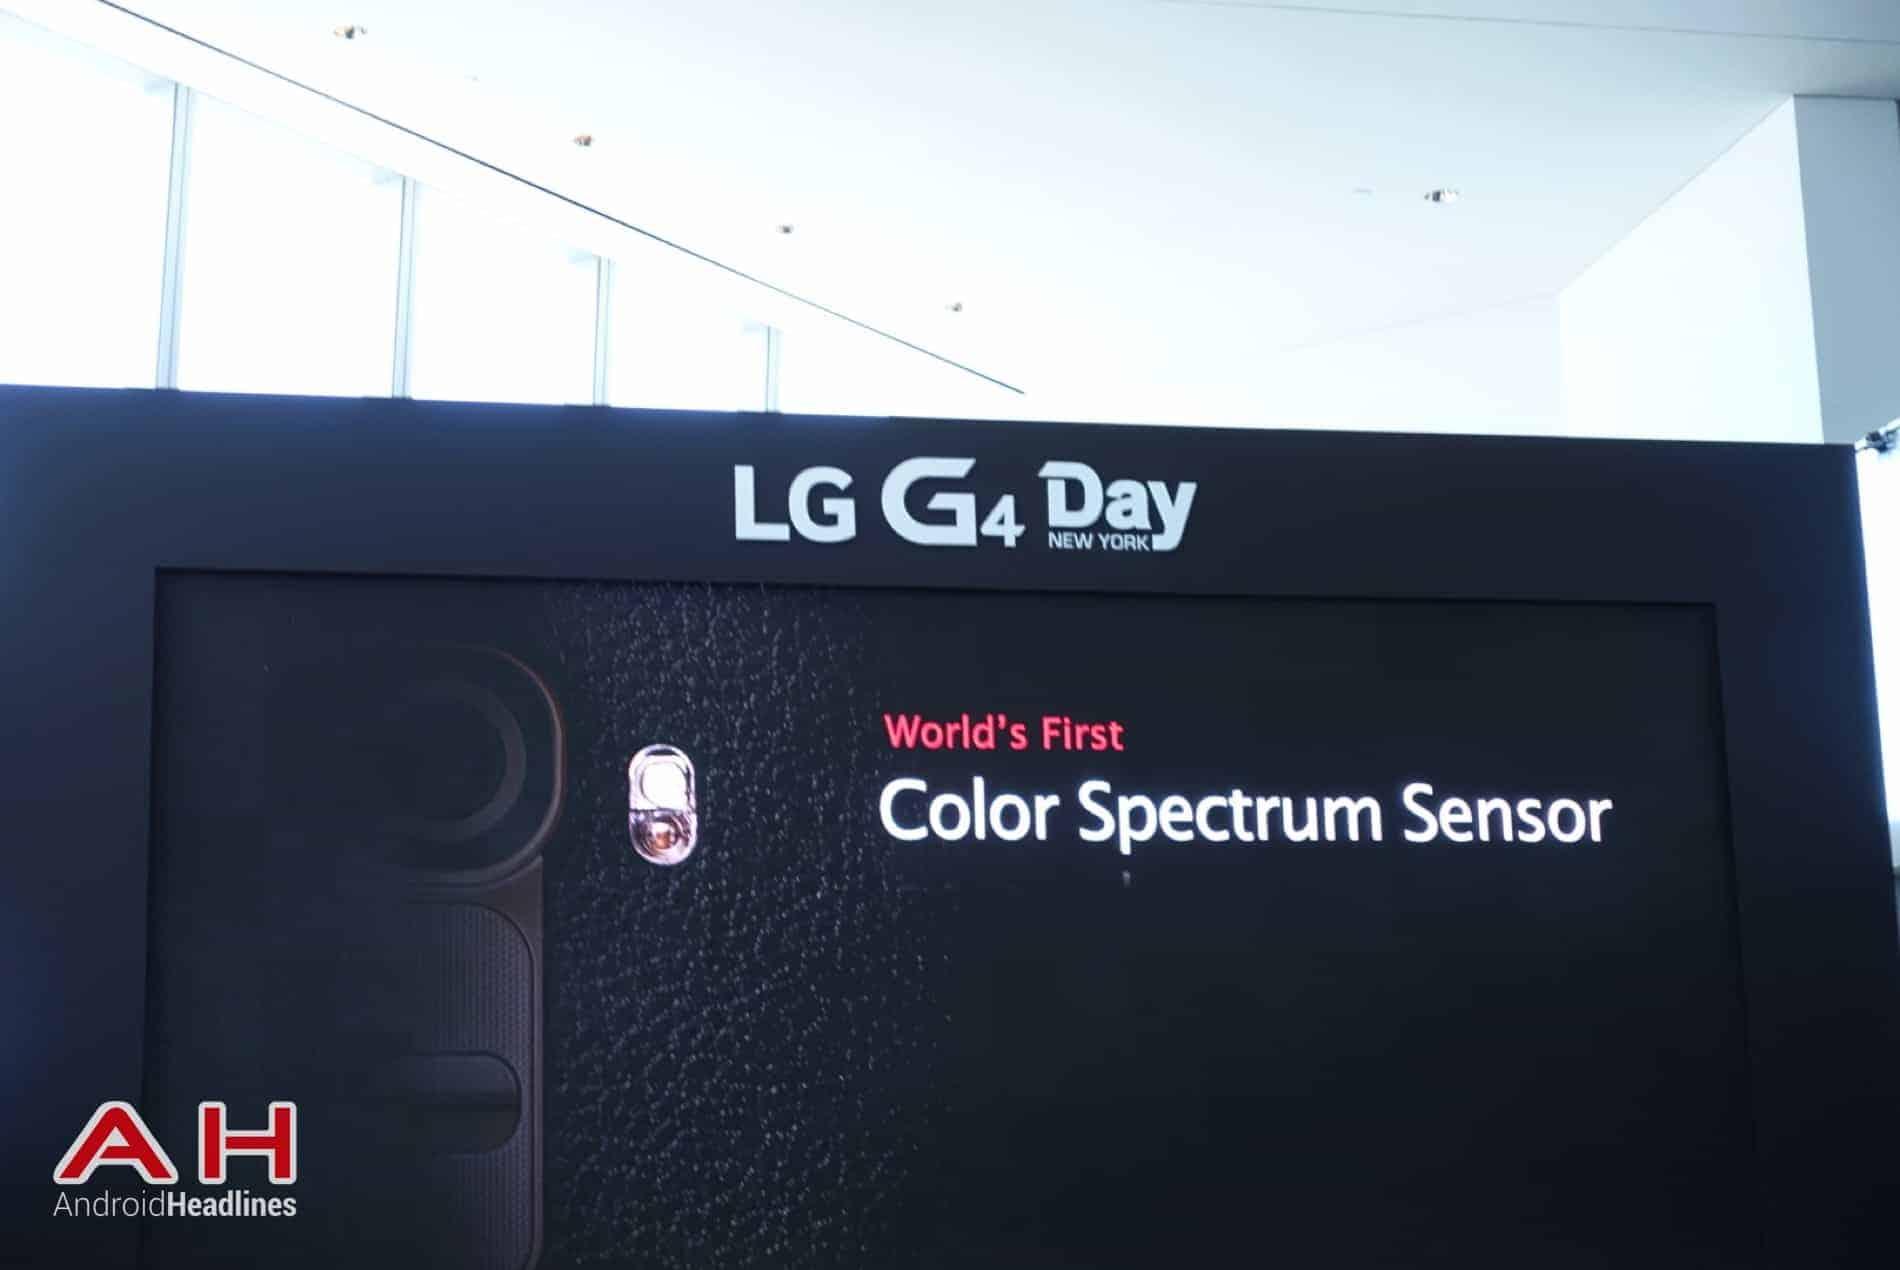 LG G4 Day AH 03 111